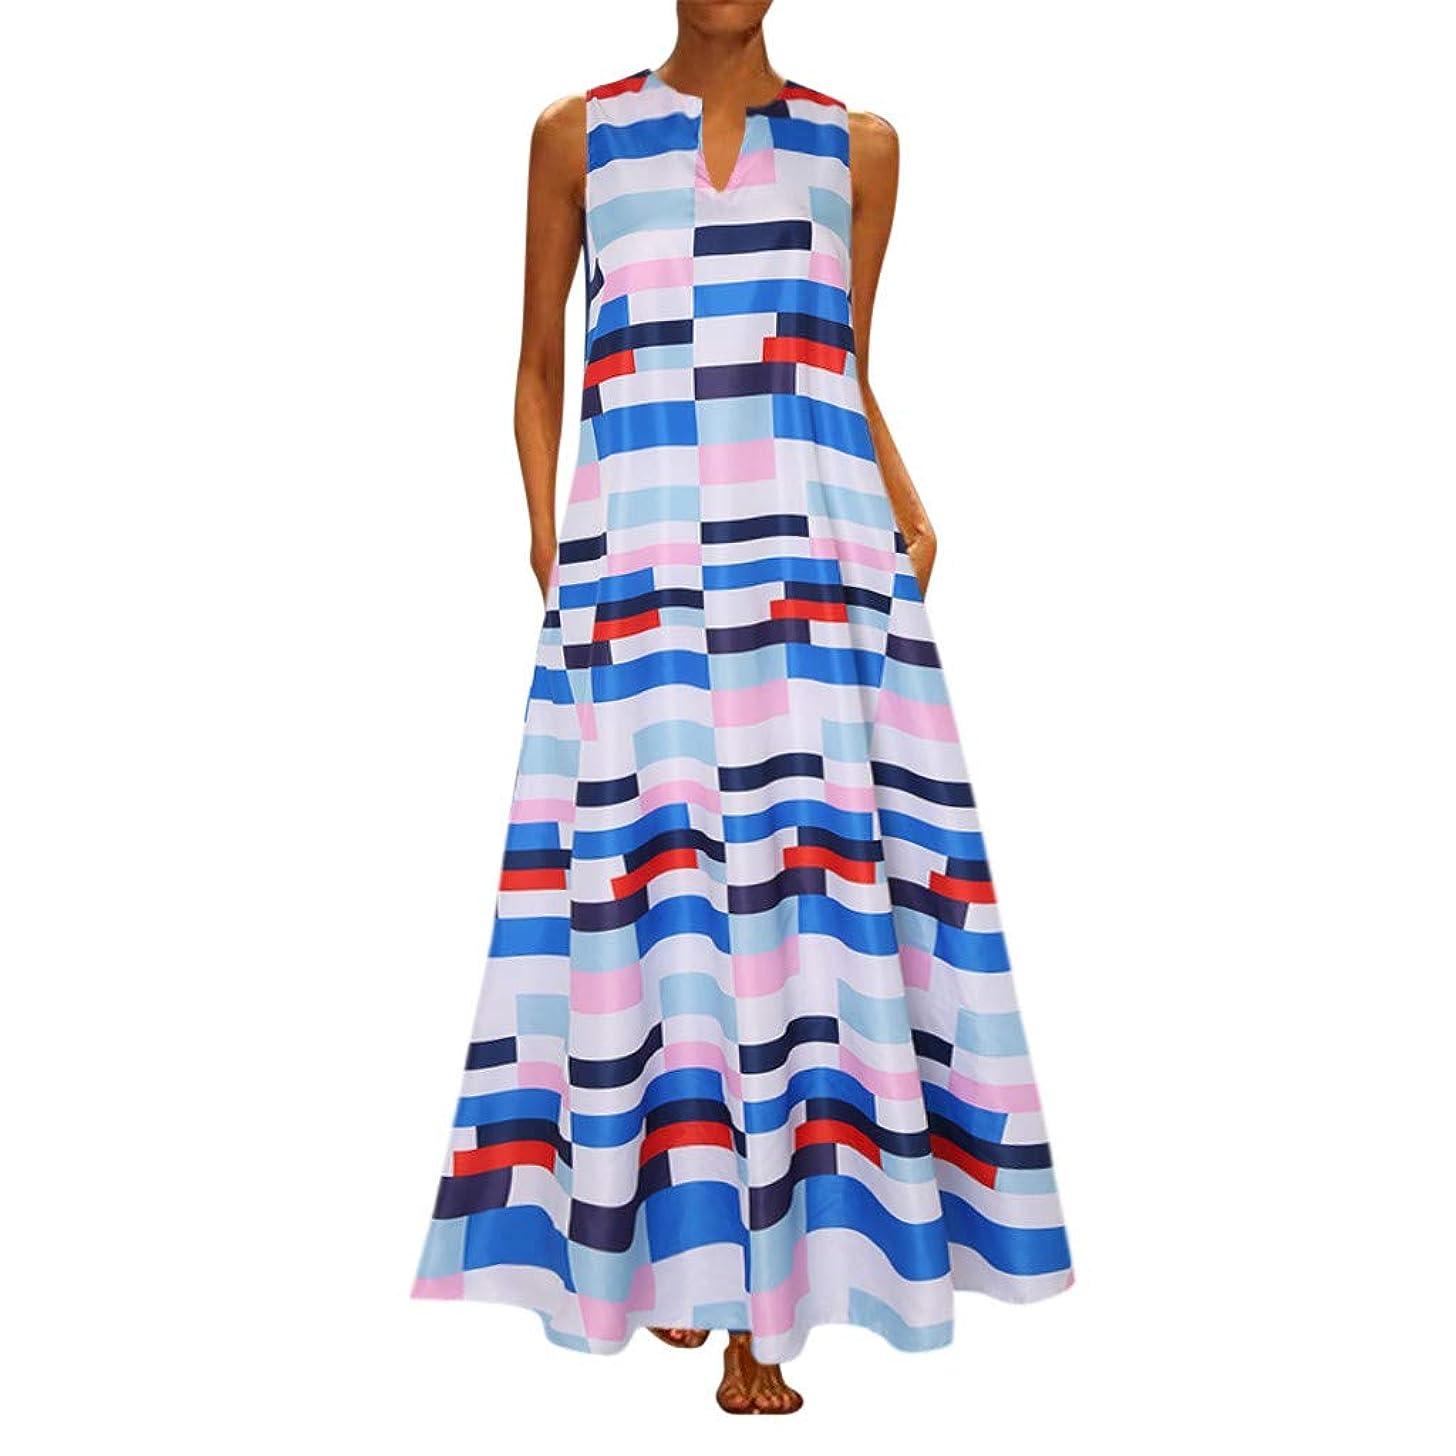 Sttech1 Women Plus Size Maxi Dress Daily Casual Sleeveless Vintage V Neck Long Dress